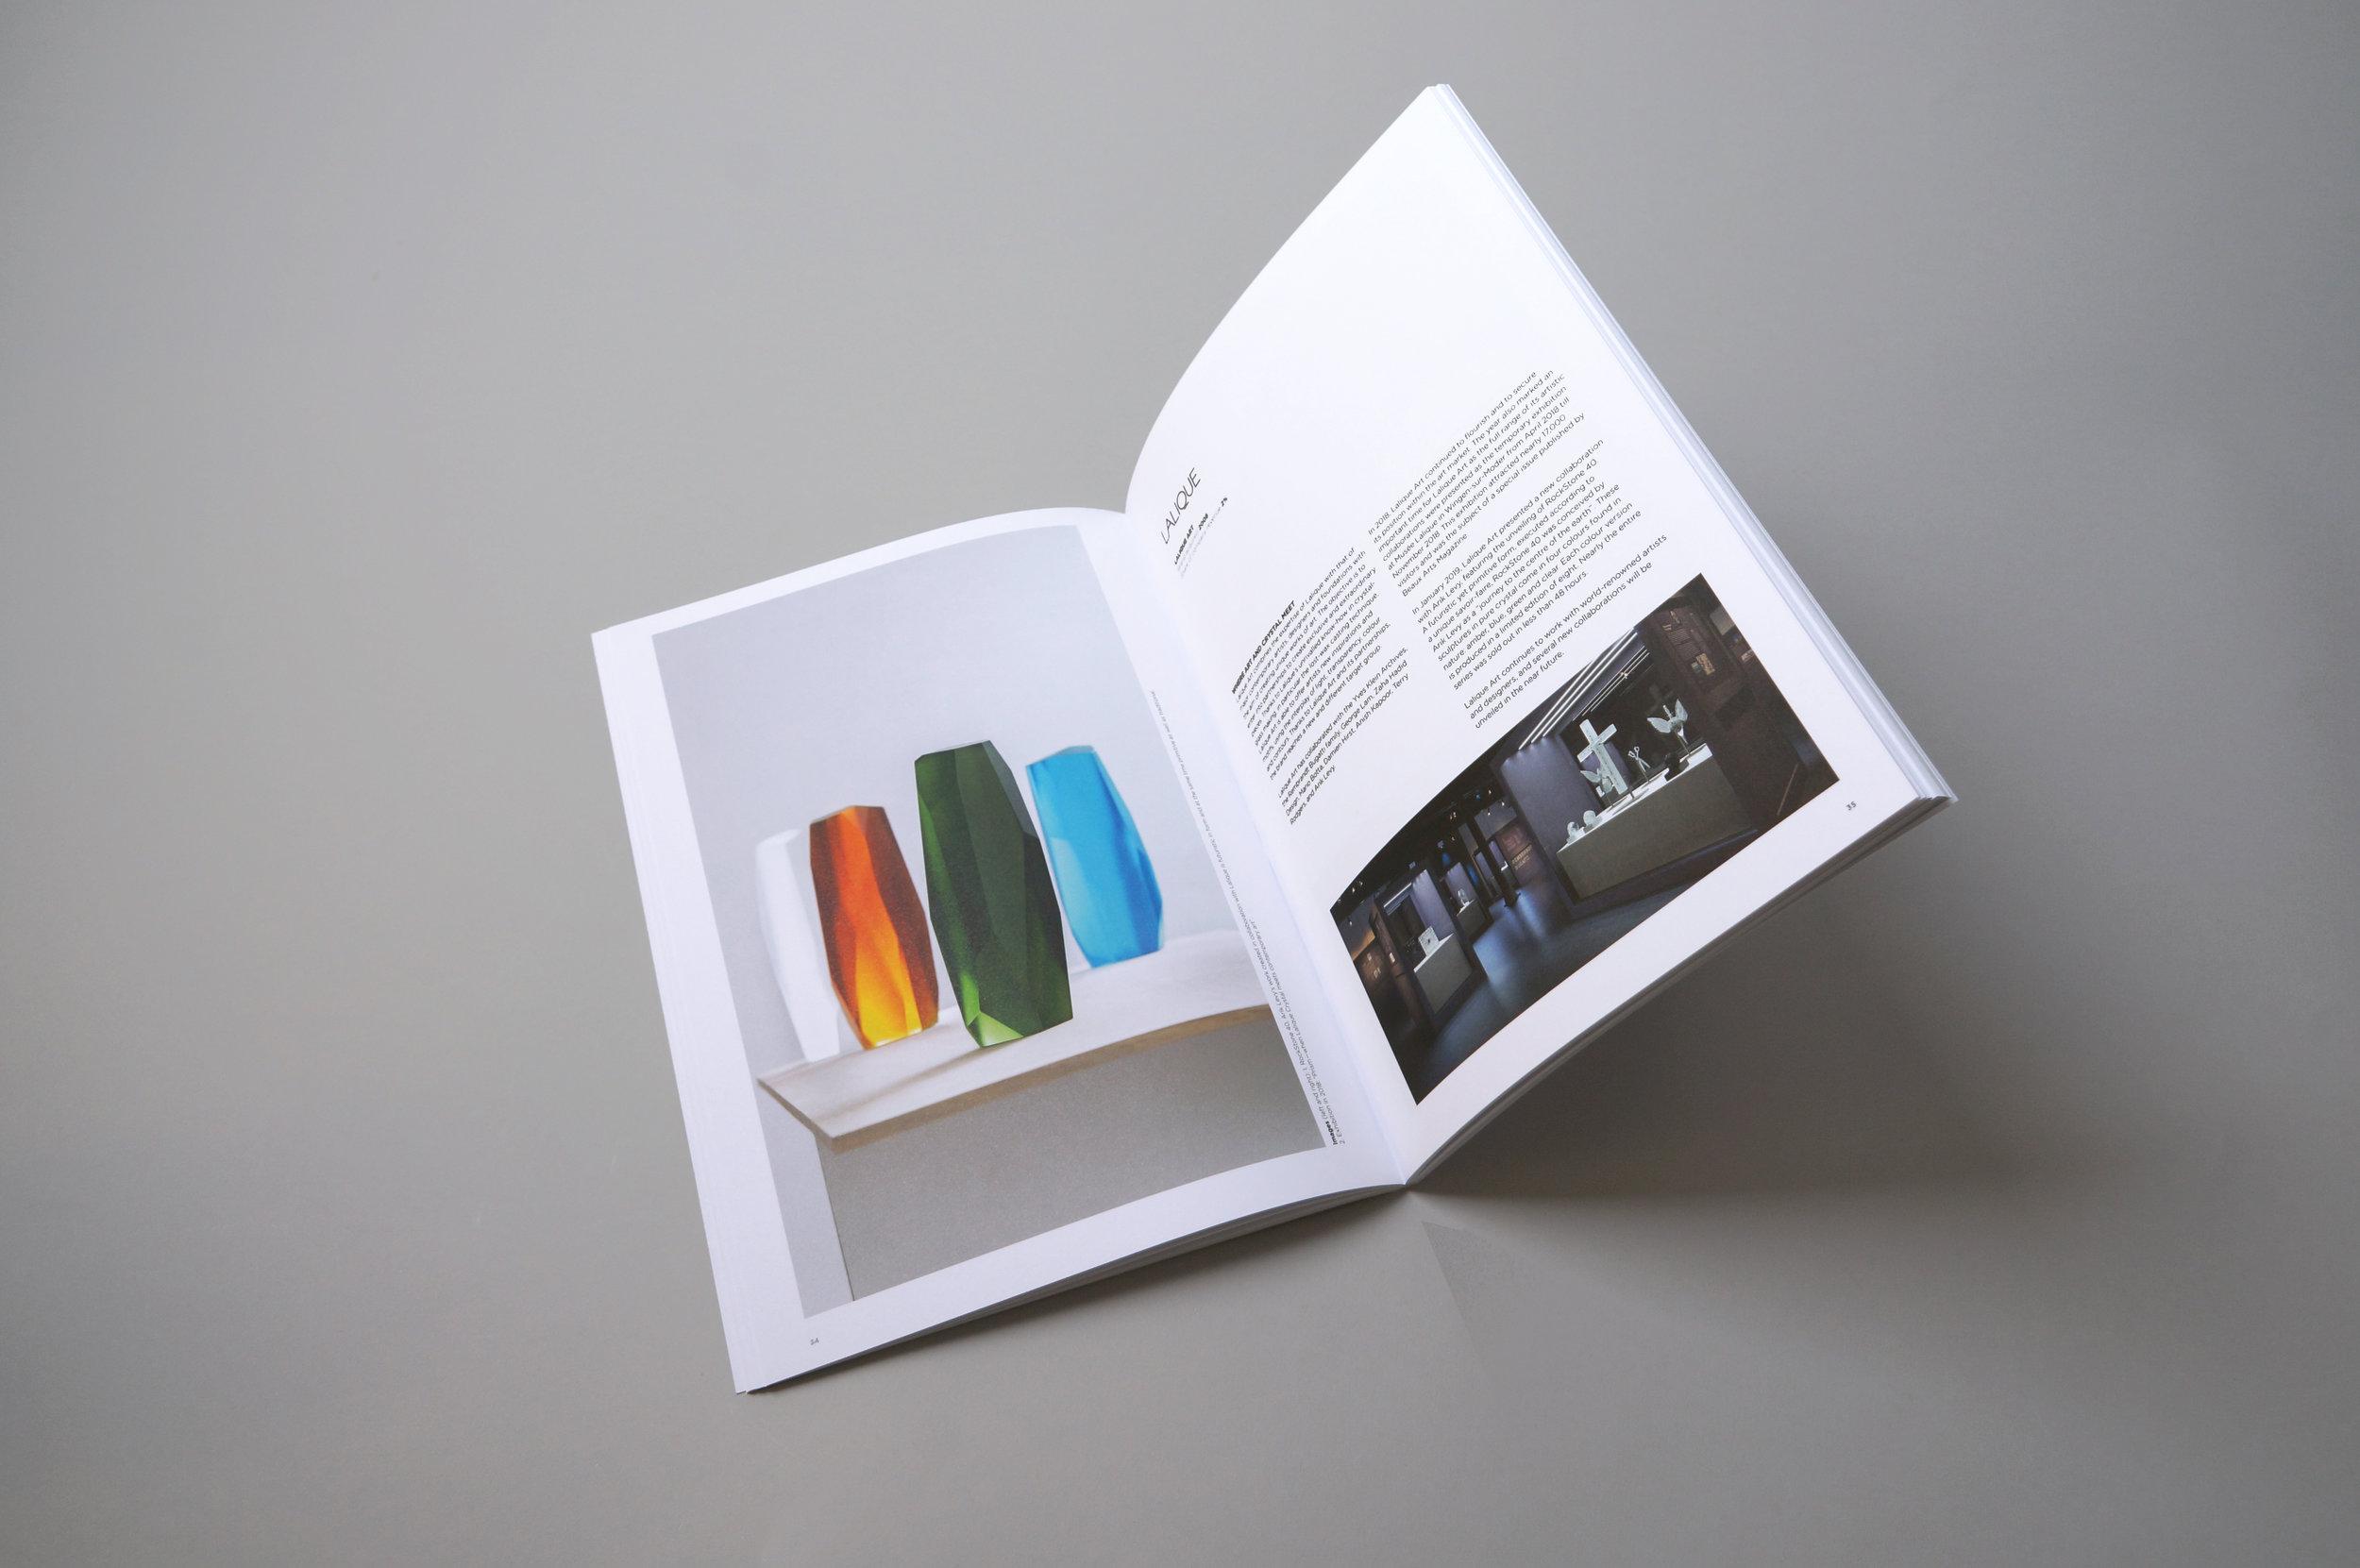 Blyss_Lalique_Annual_Report_11.jpg